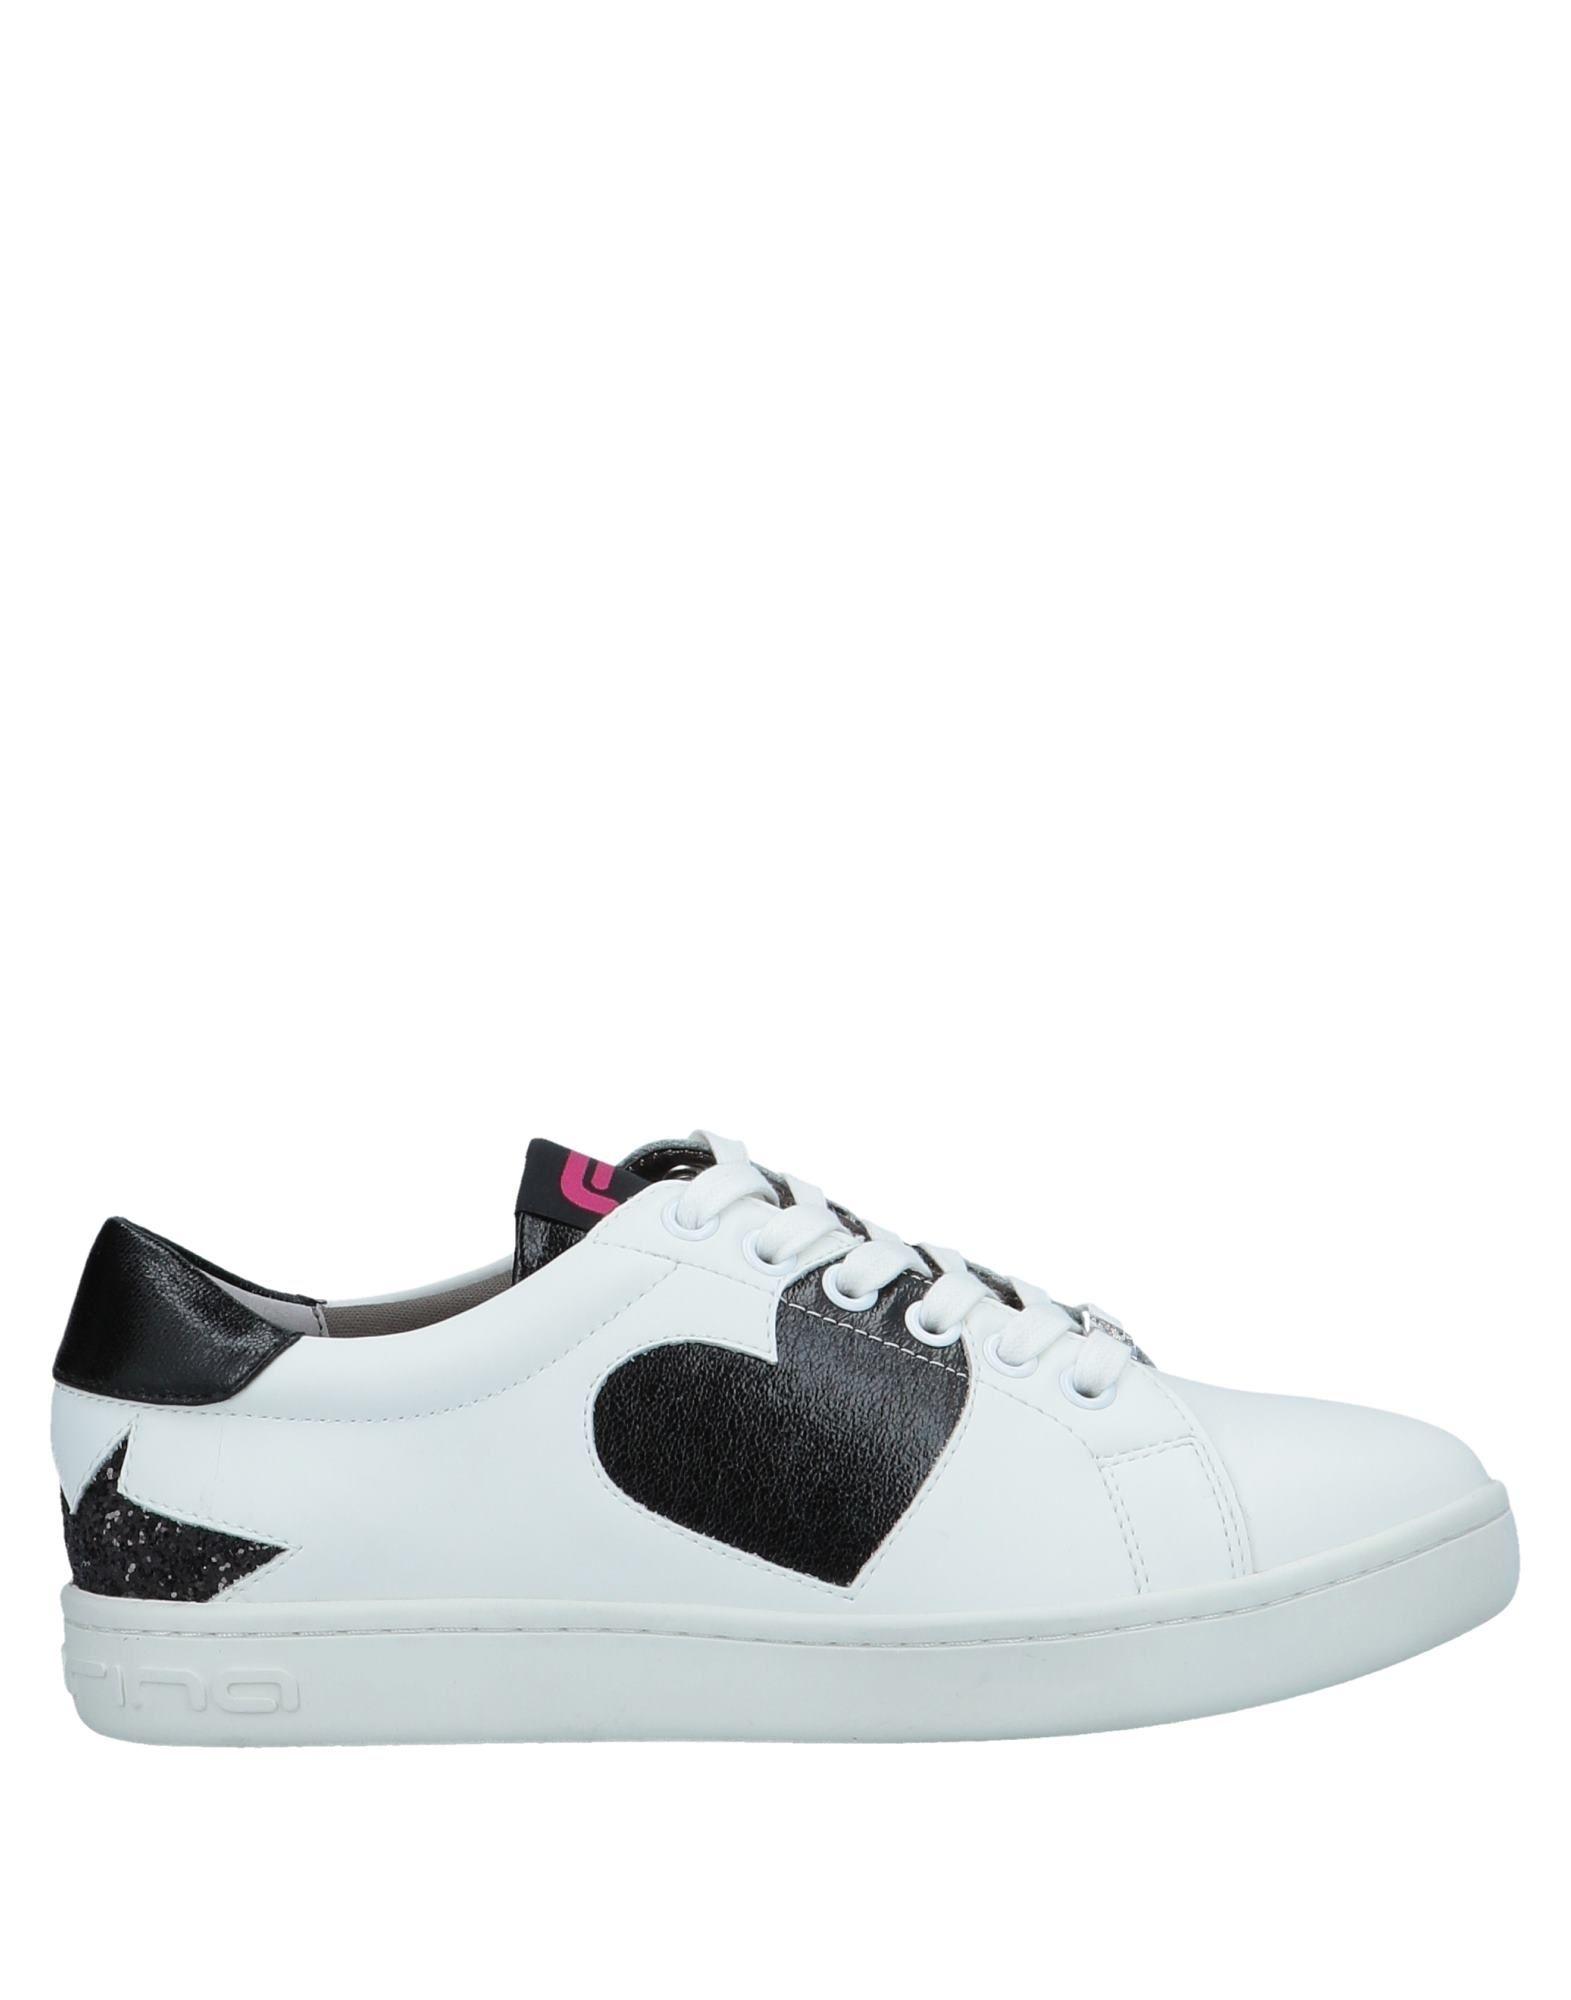 Baskets Fornarina Femme Chaussures - Baskets Fornarina Blanc Chaussures Femme casual sauvages 6e305a